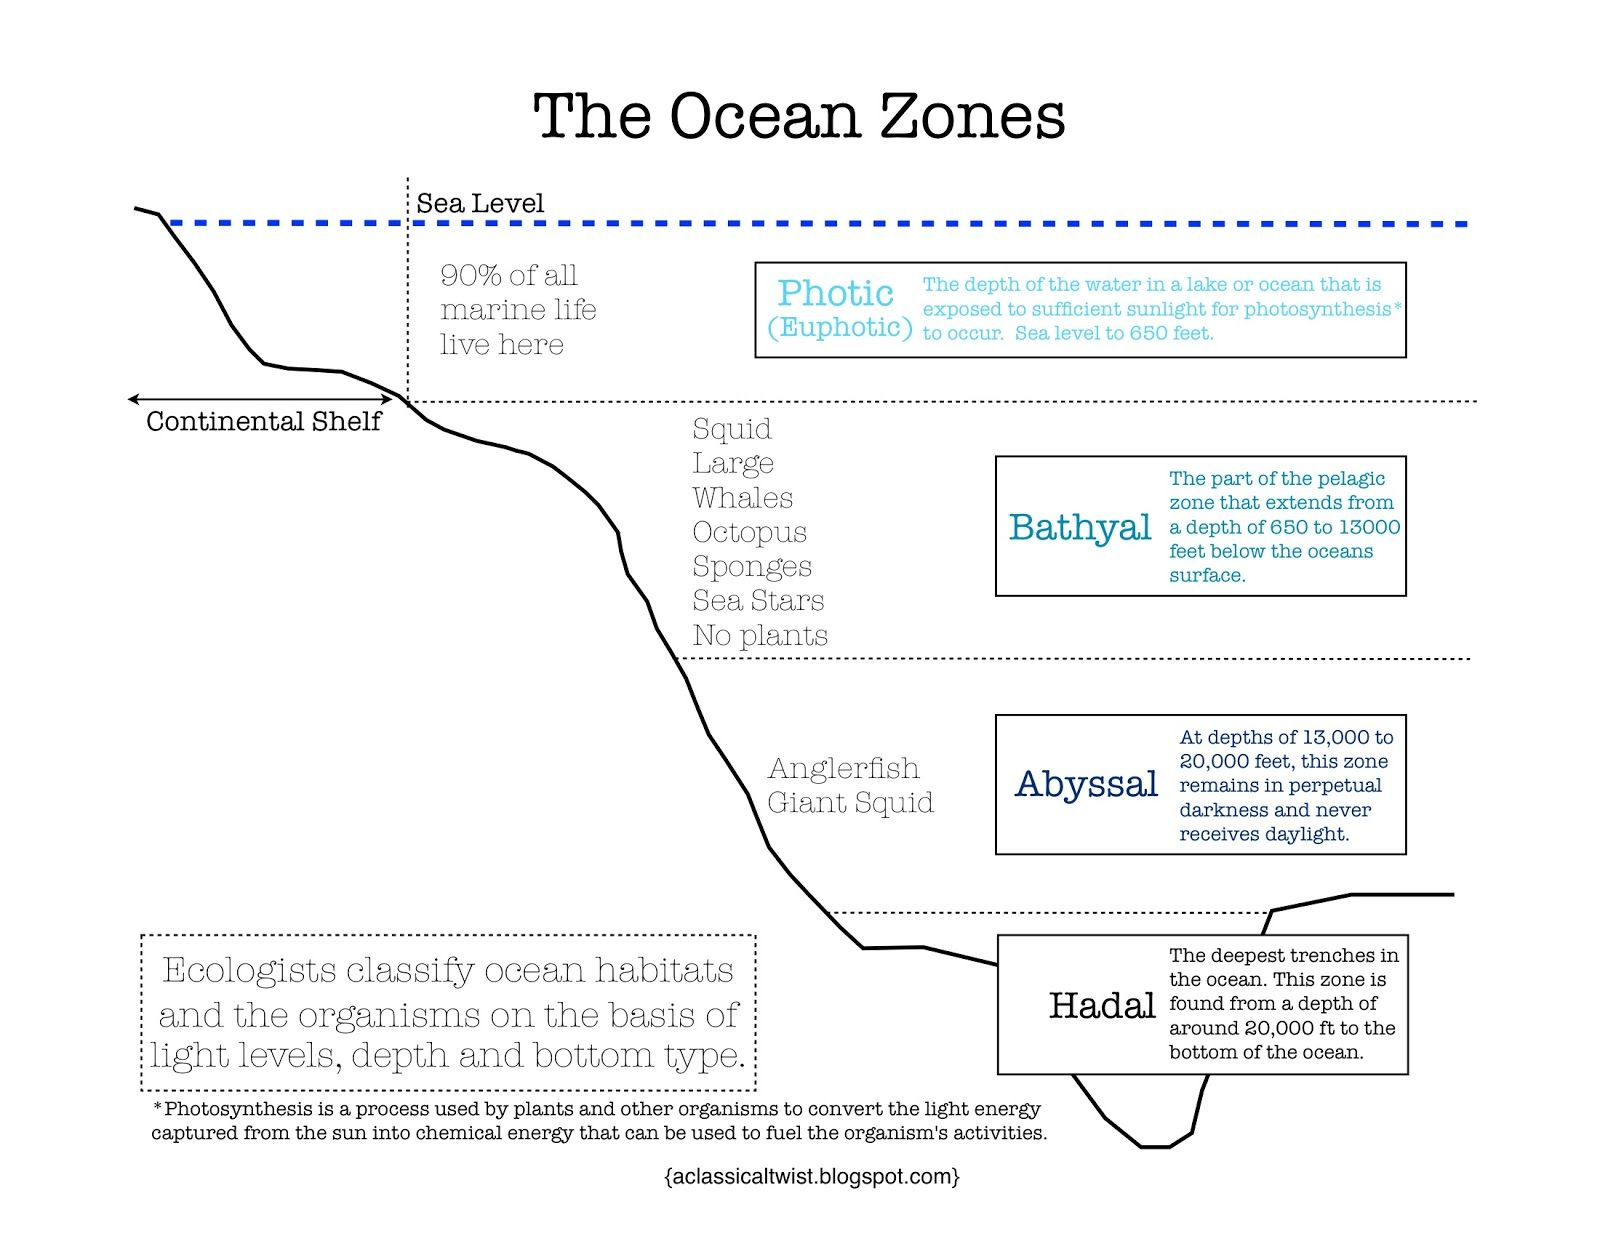 ocean zones worksheet images galleries with a bite. Black Bedroom Furniture Sets. Home Design Ideas